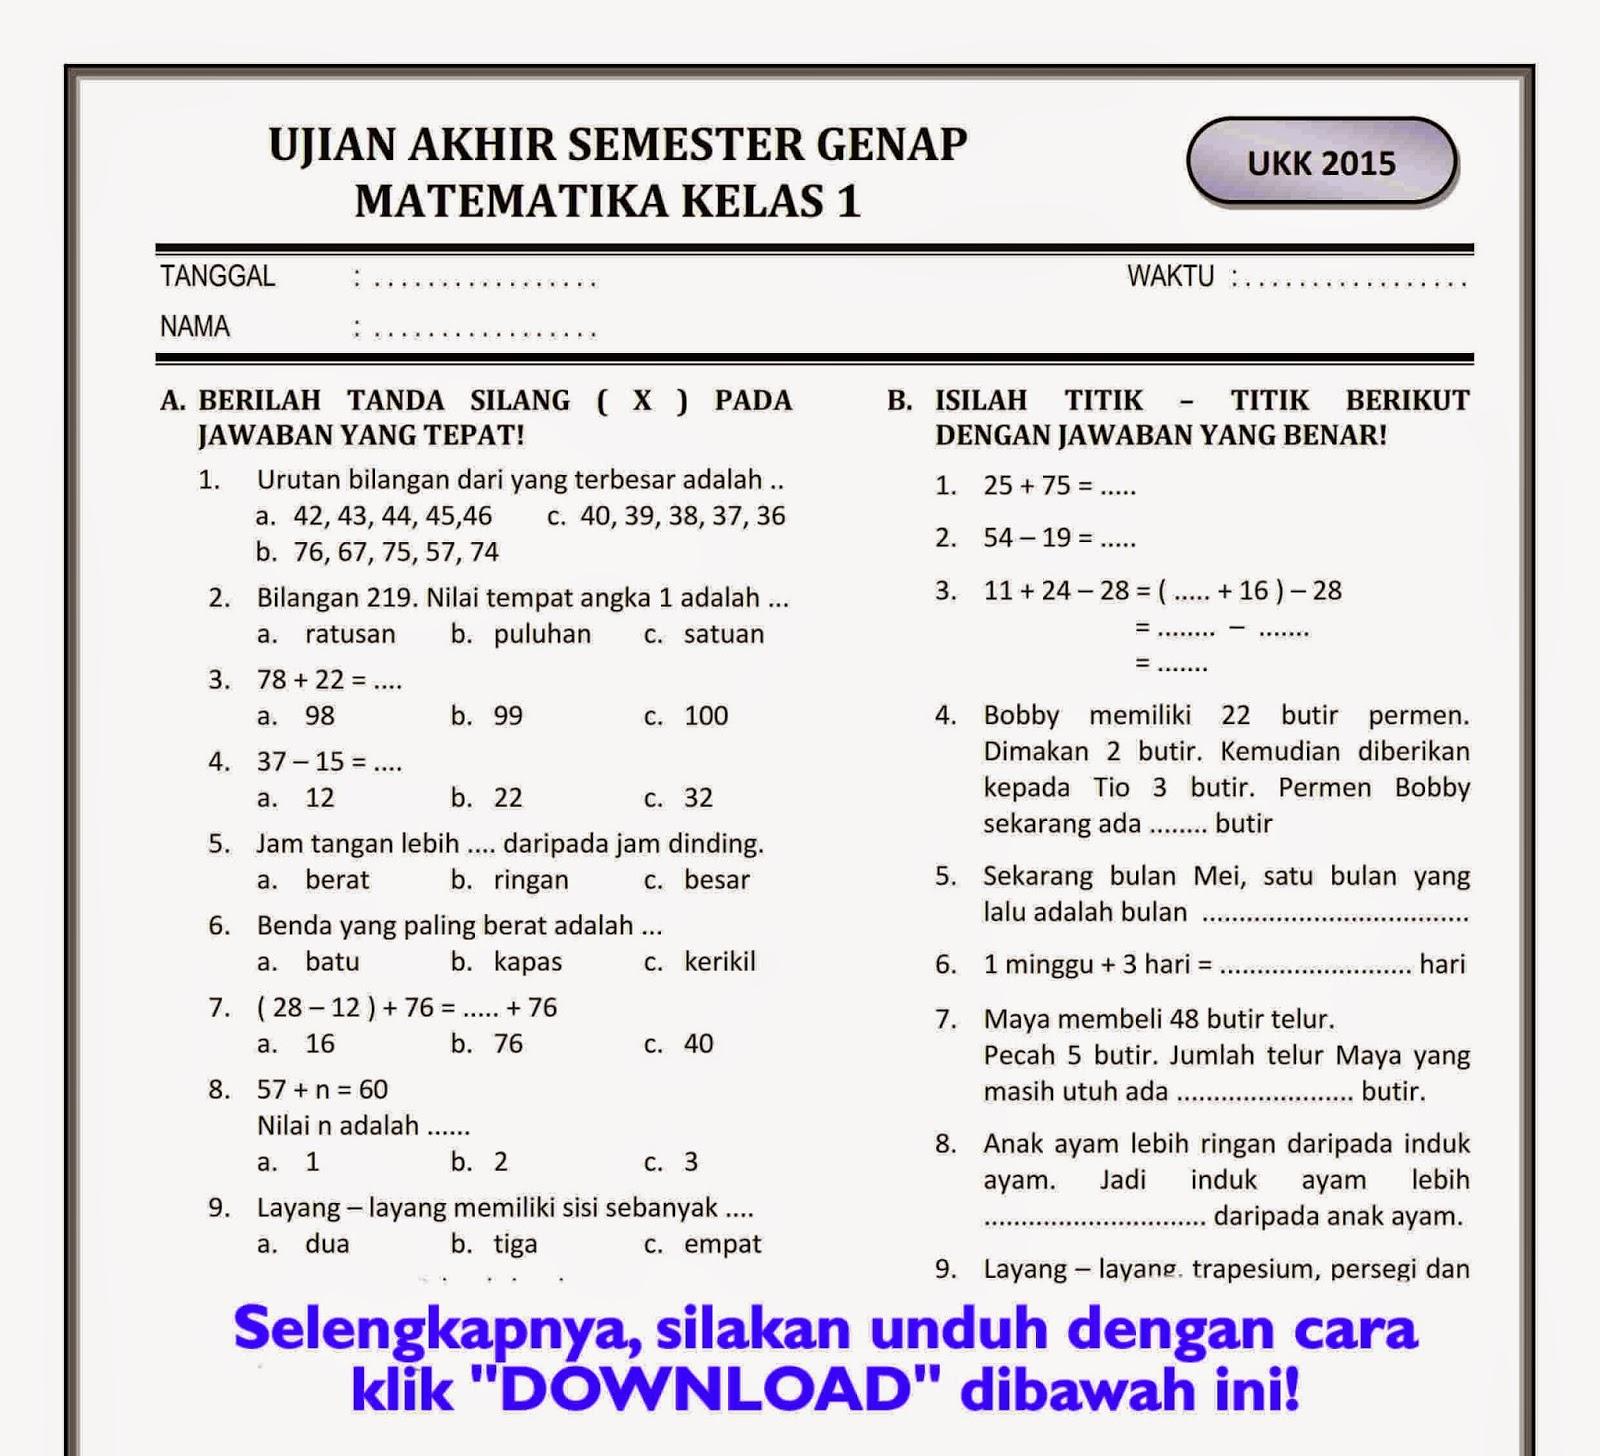 Contoh Soal UKK PJOK Kelas 2 SD Terbaru dan Kunci Jawaban